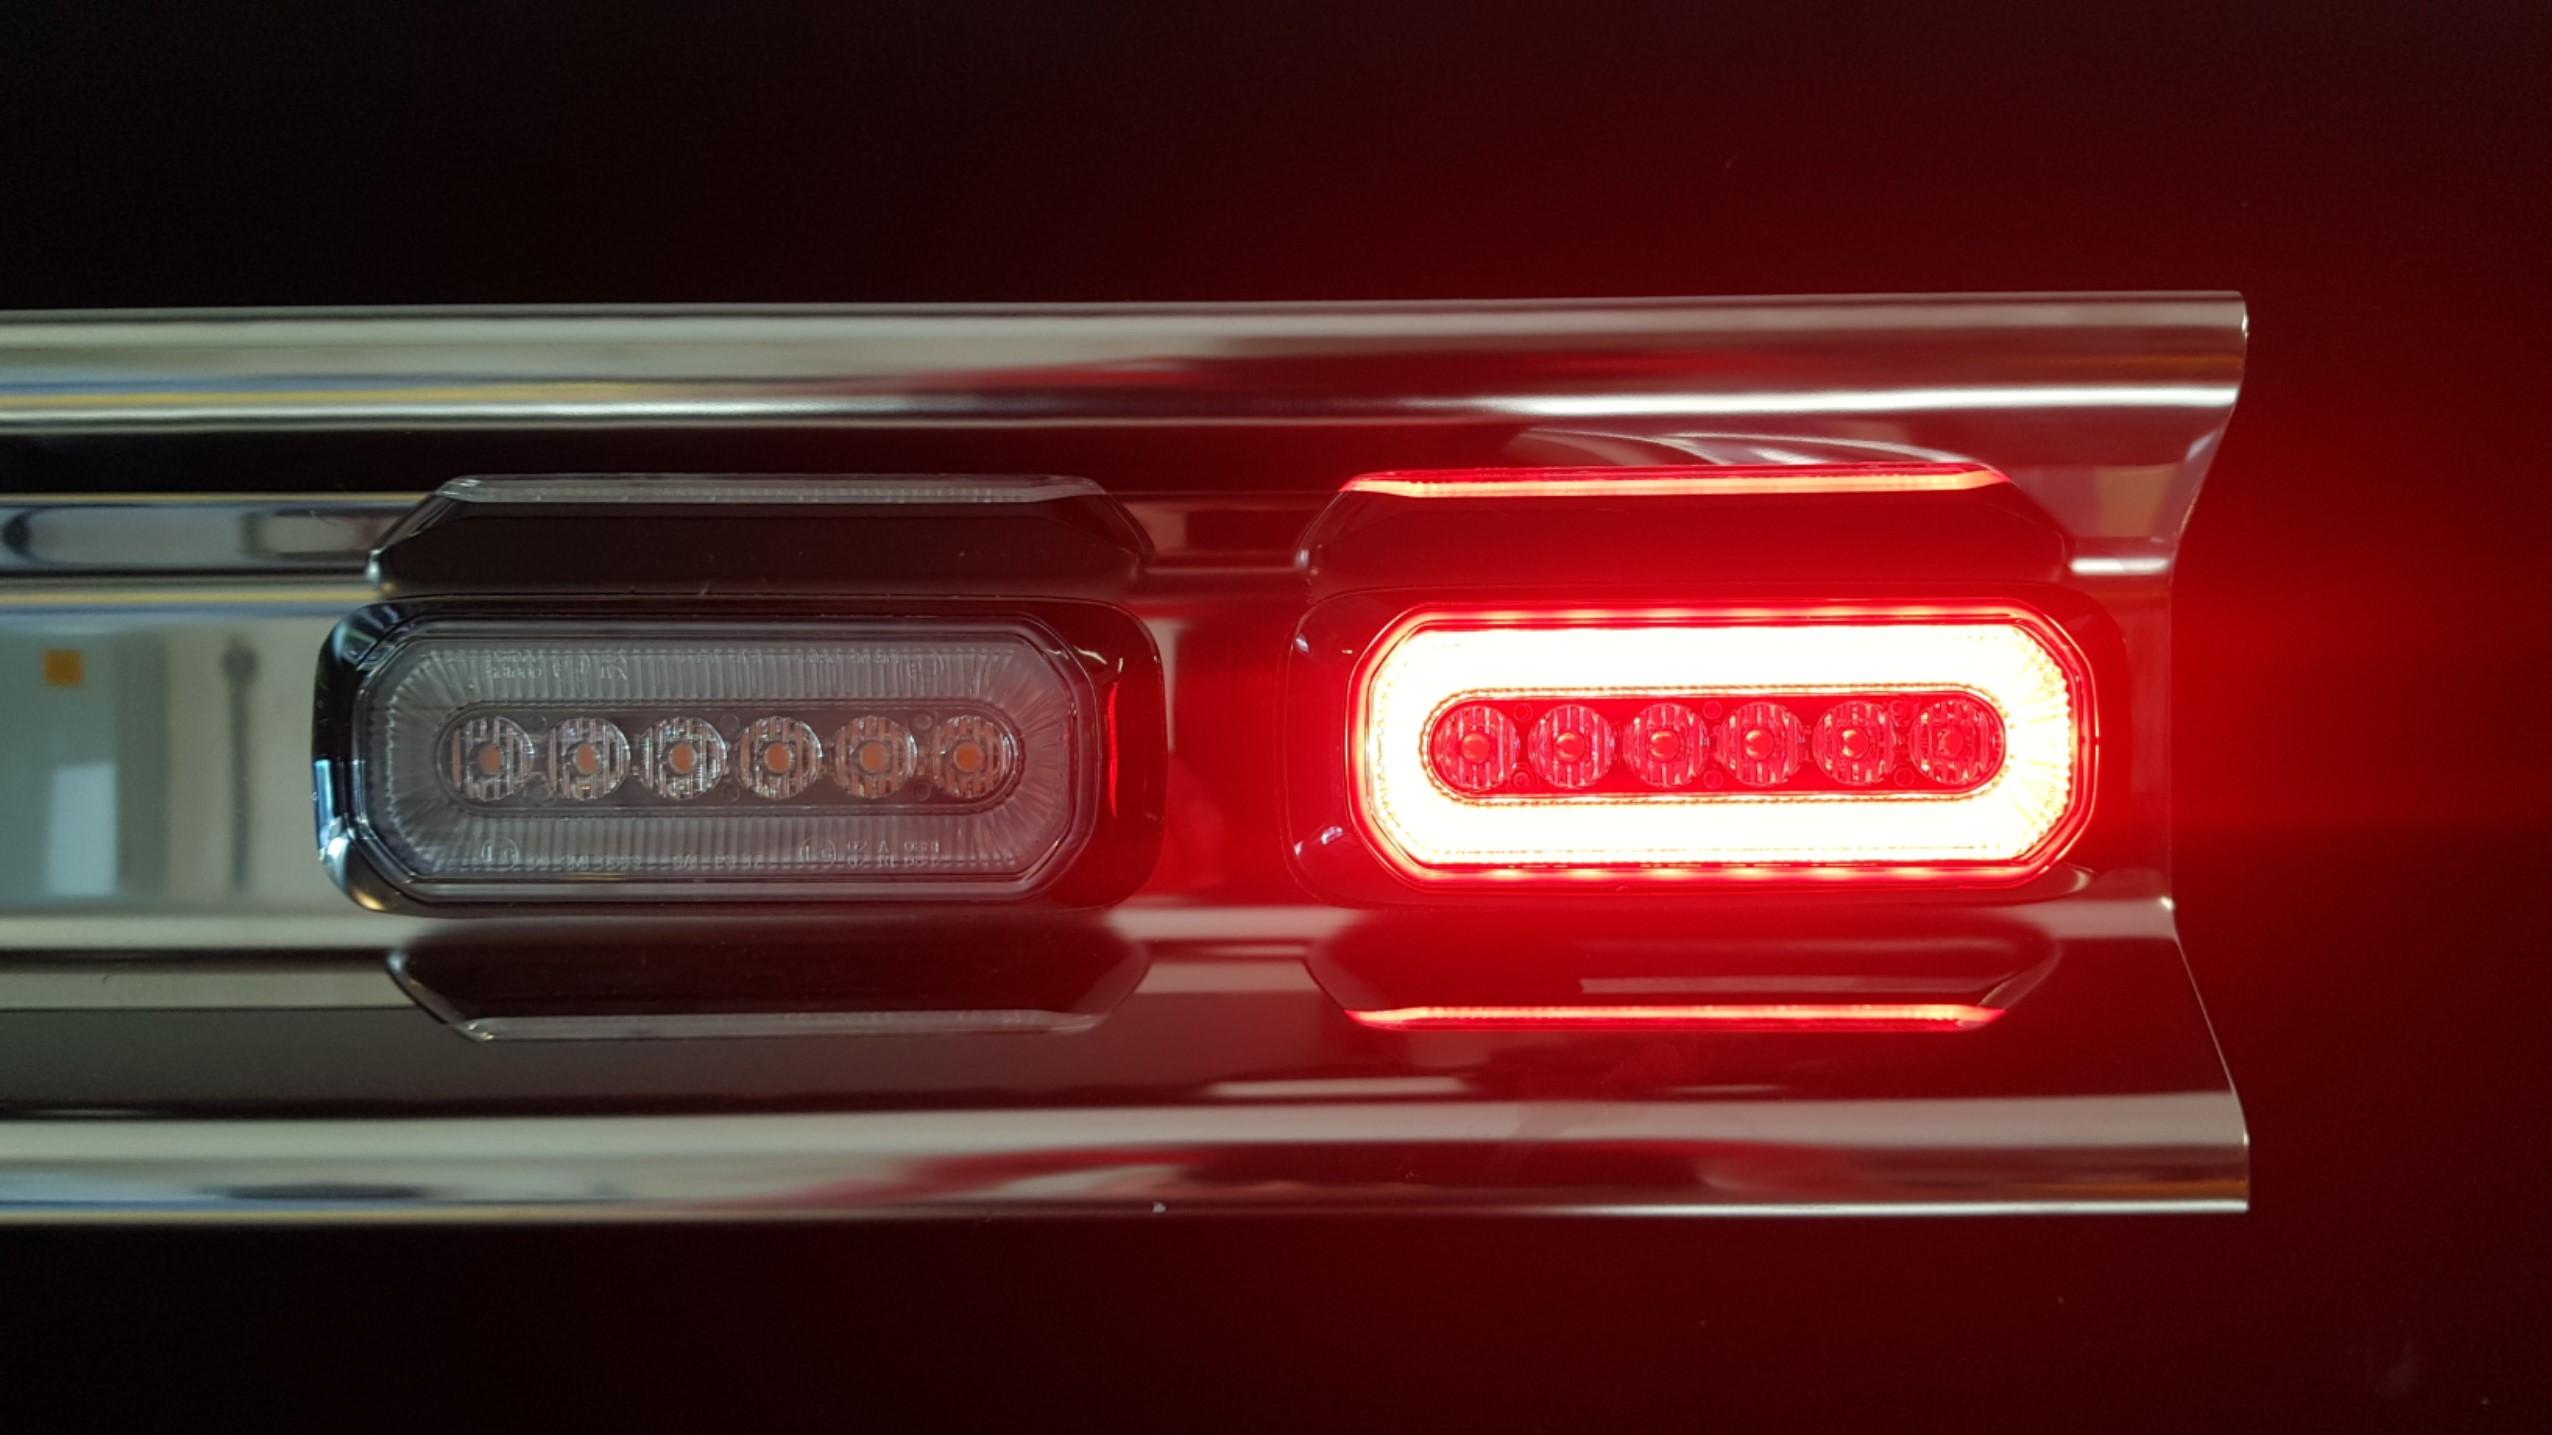 Peterson SL10451 LED warning light PAIR